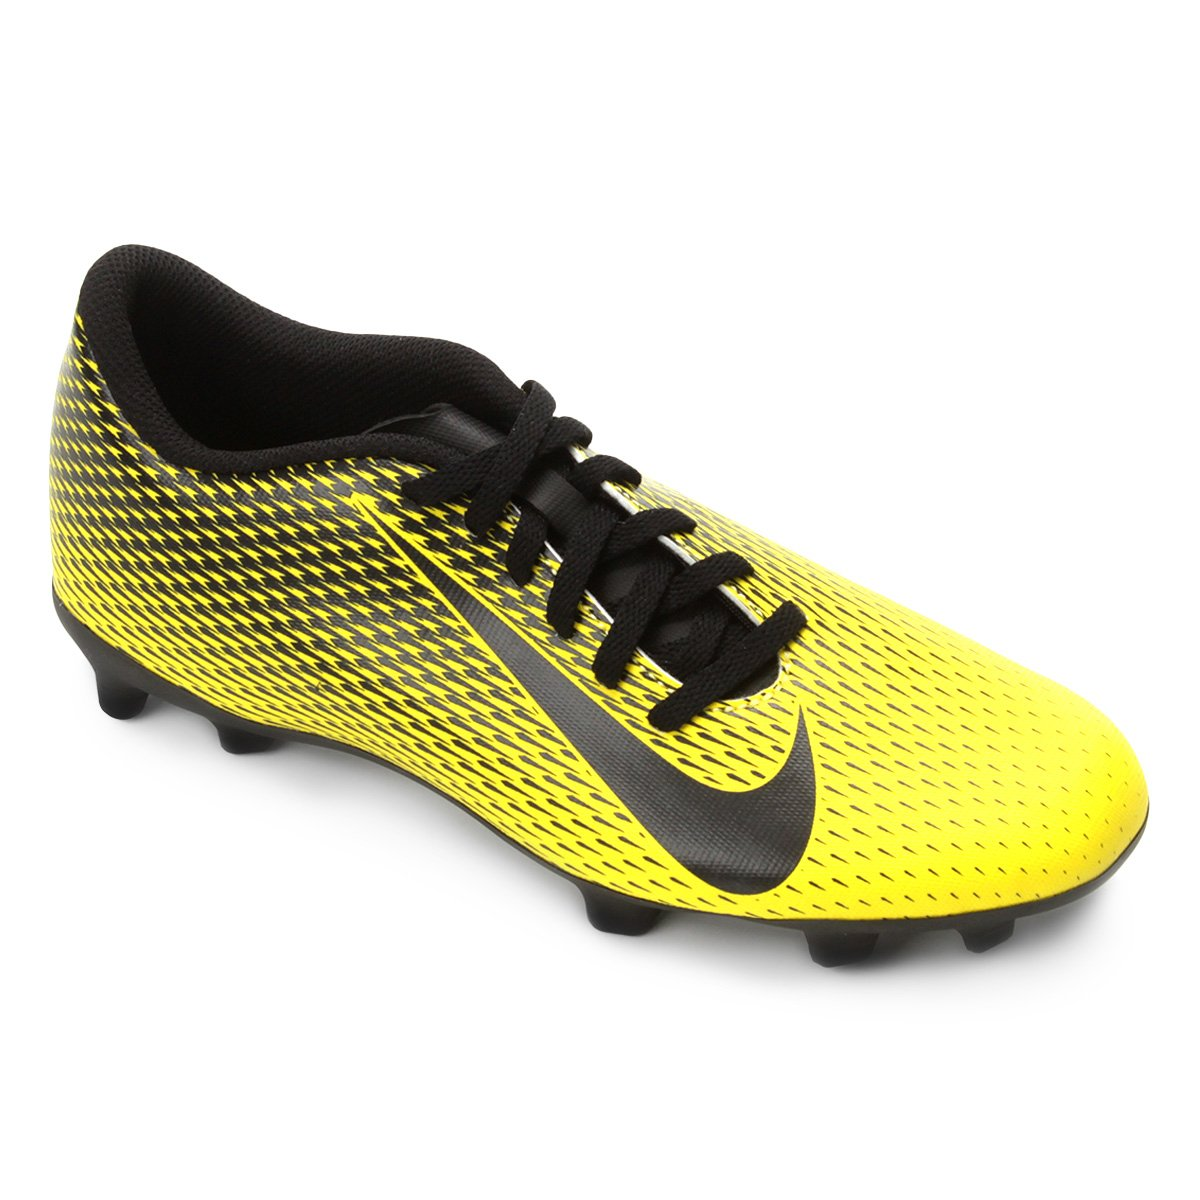 2ea7382b54 Chuteira Campo Nike Bravata II FG - Amarelo e Preto - Compre Agora ...